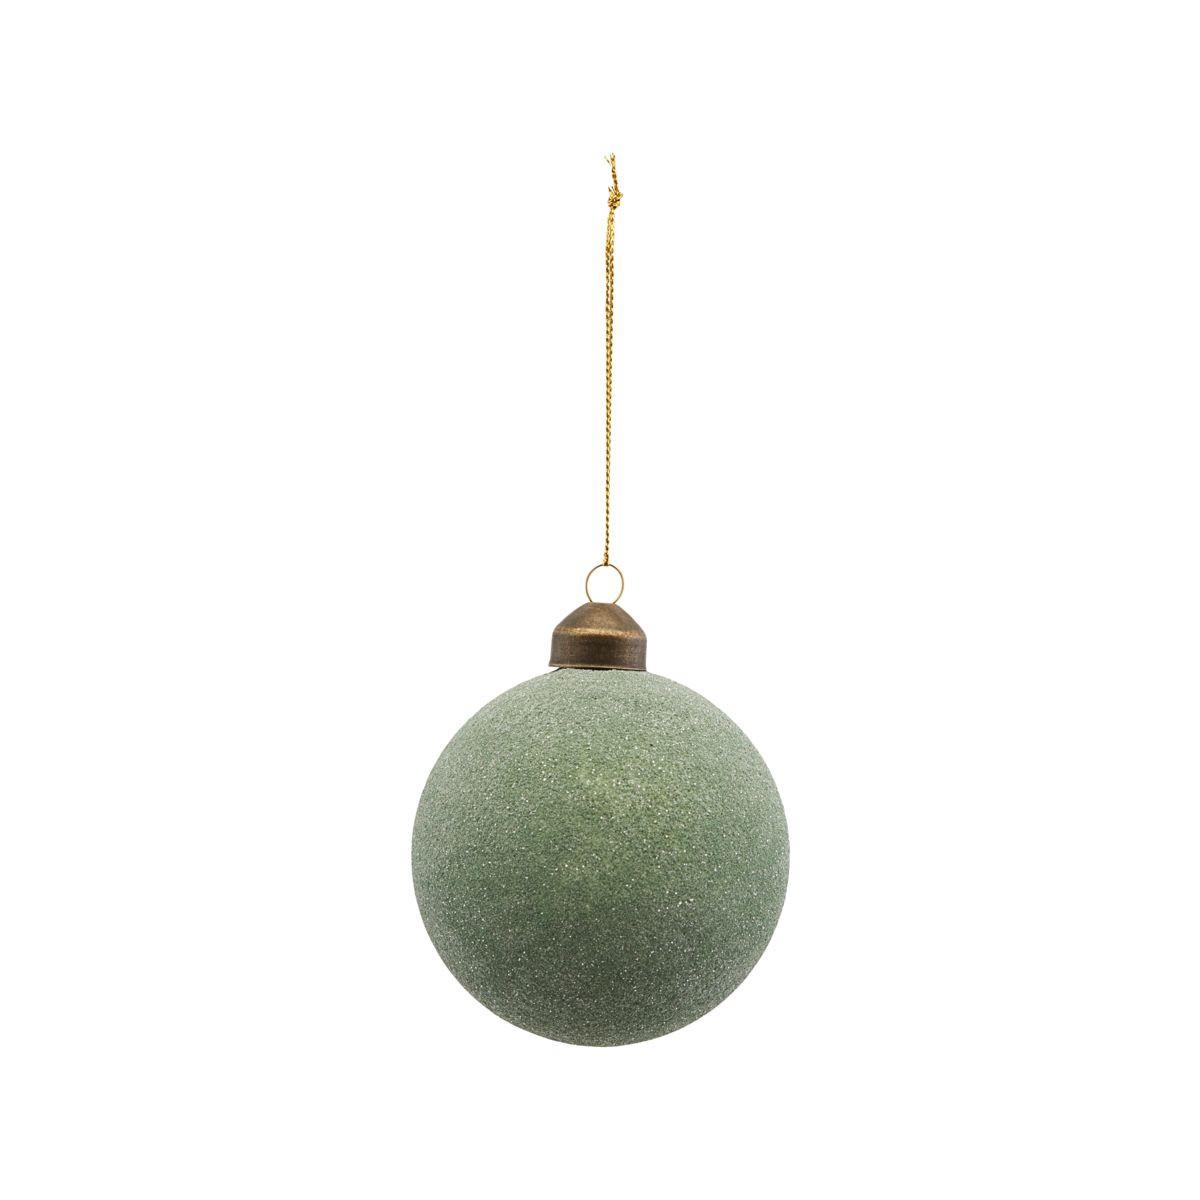 House Doctor Glittery Ornament Green Ø 10 cm